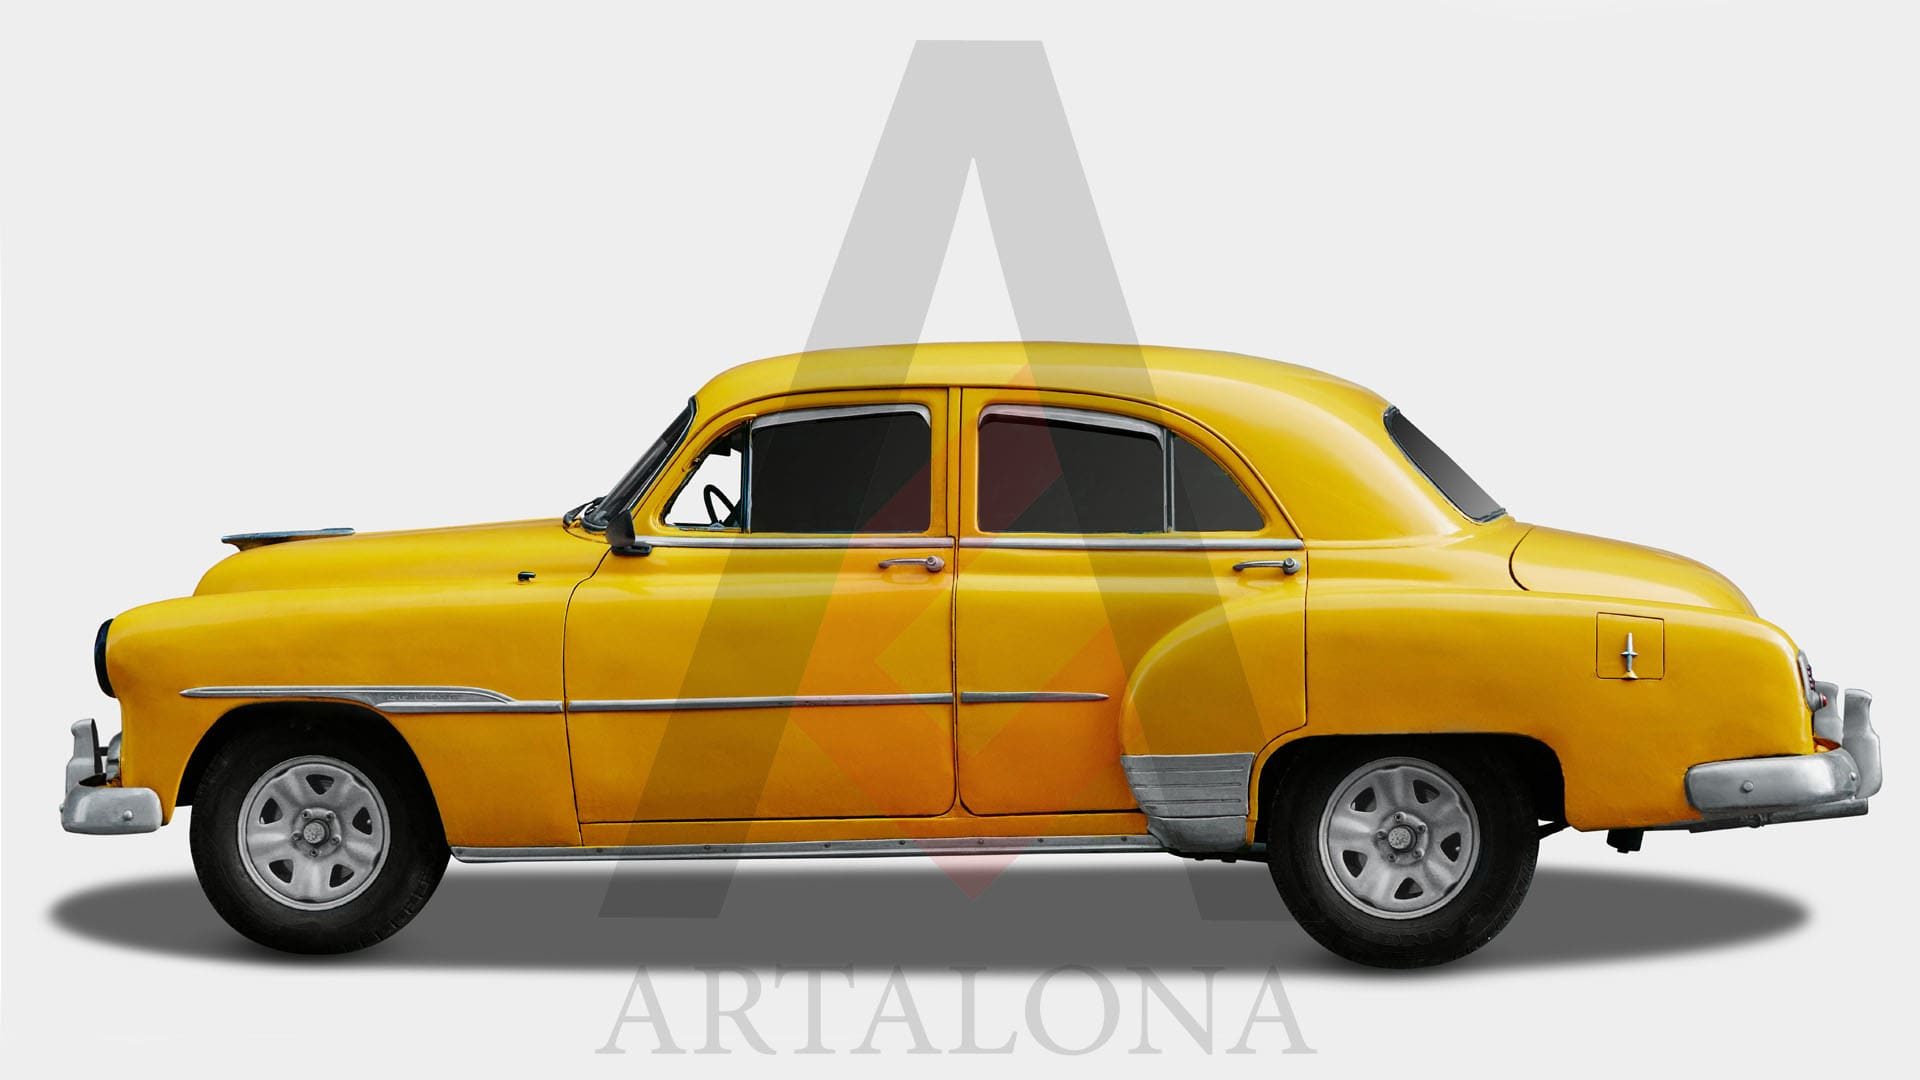 After-Automotive Background Removal